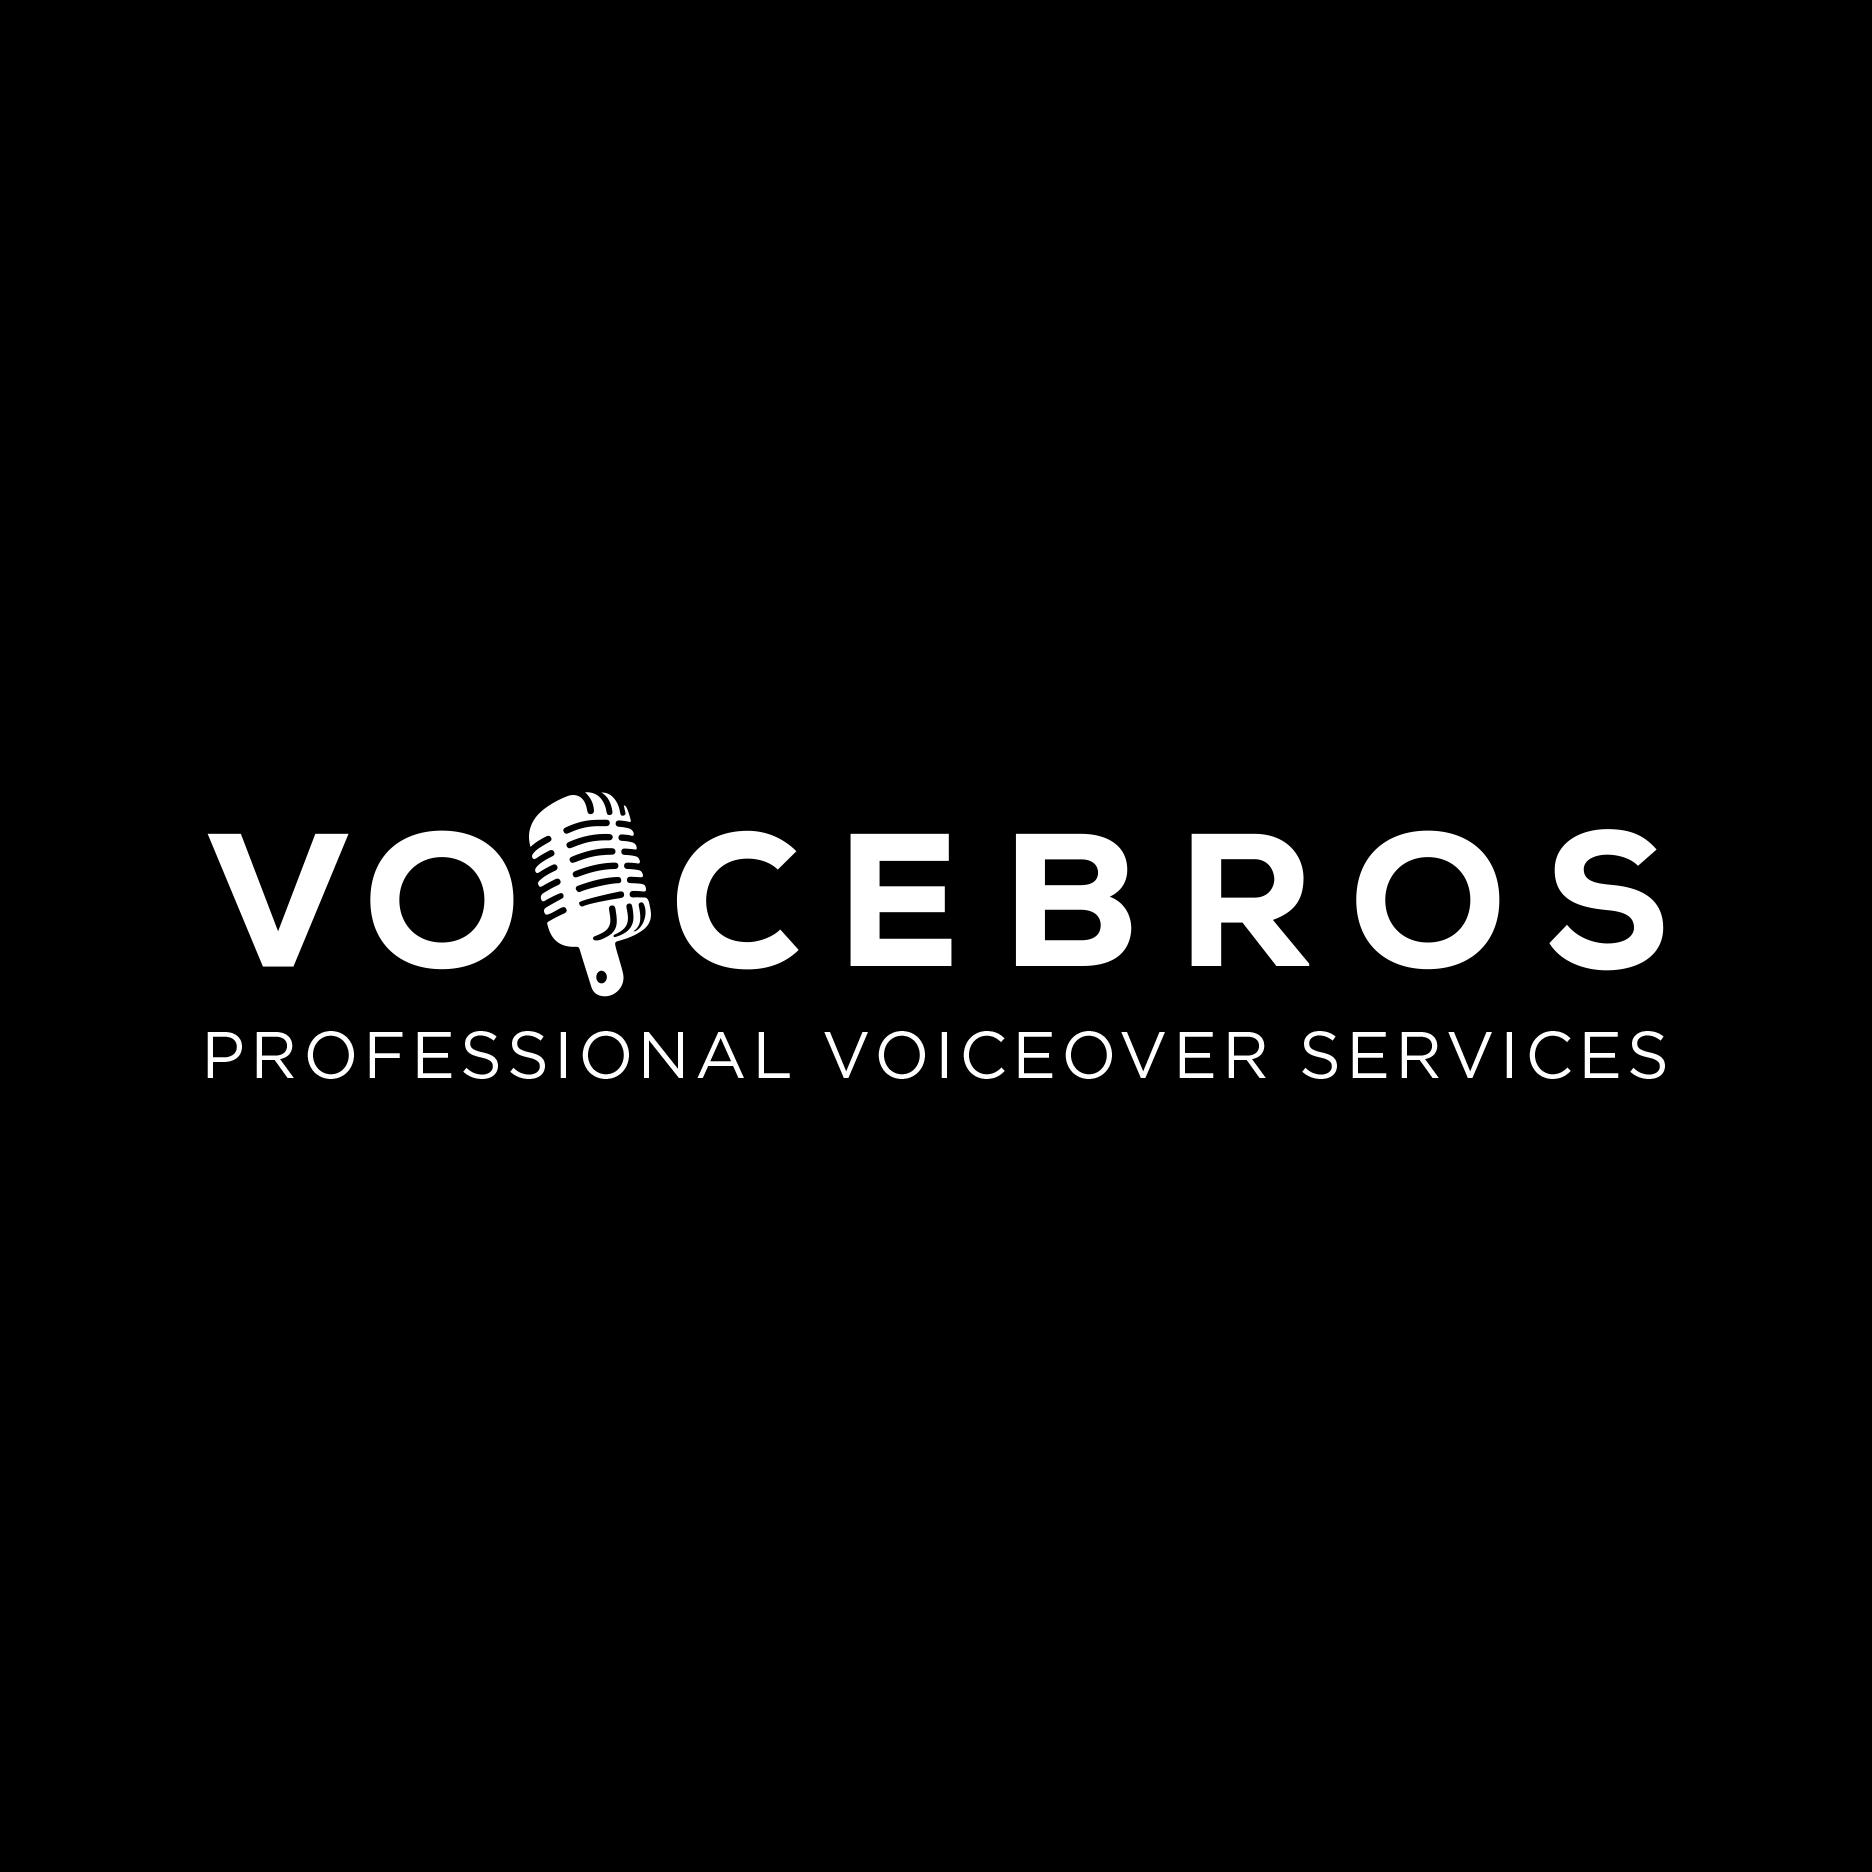 Kim-Marie Santiago is a voice over actor